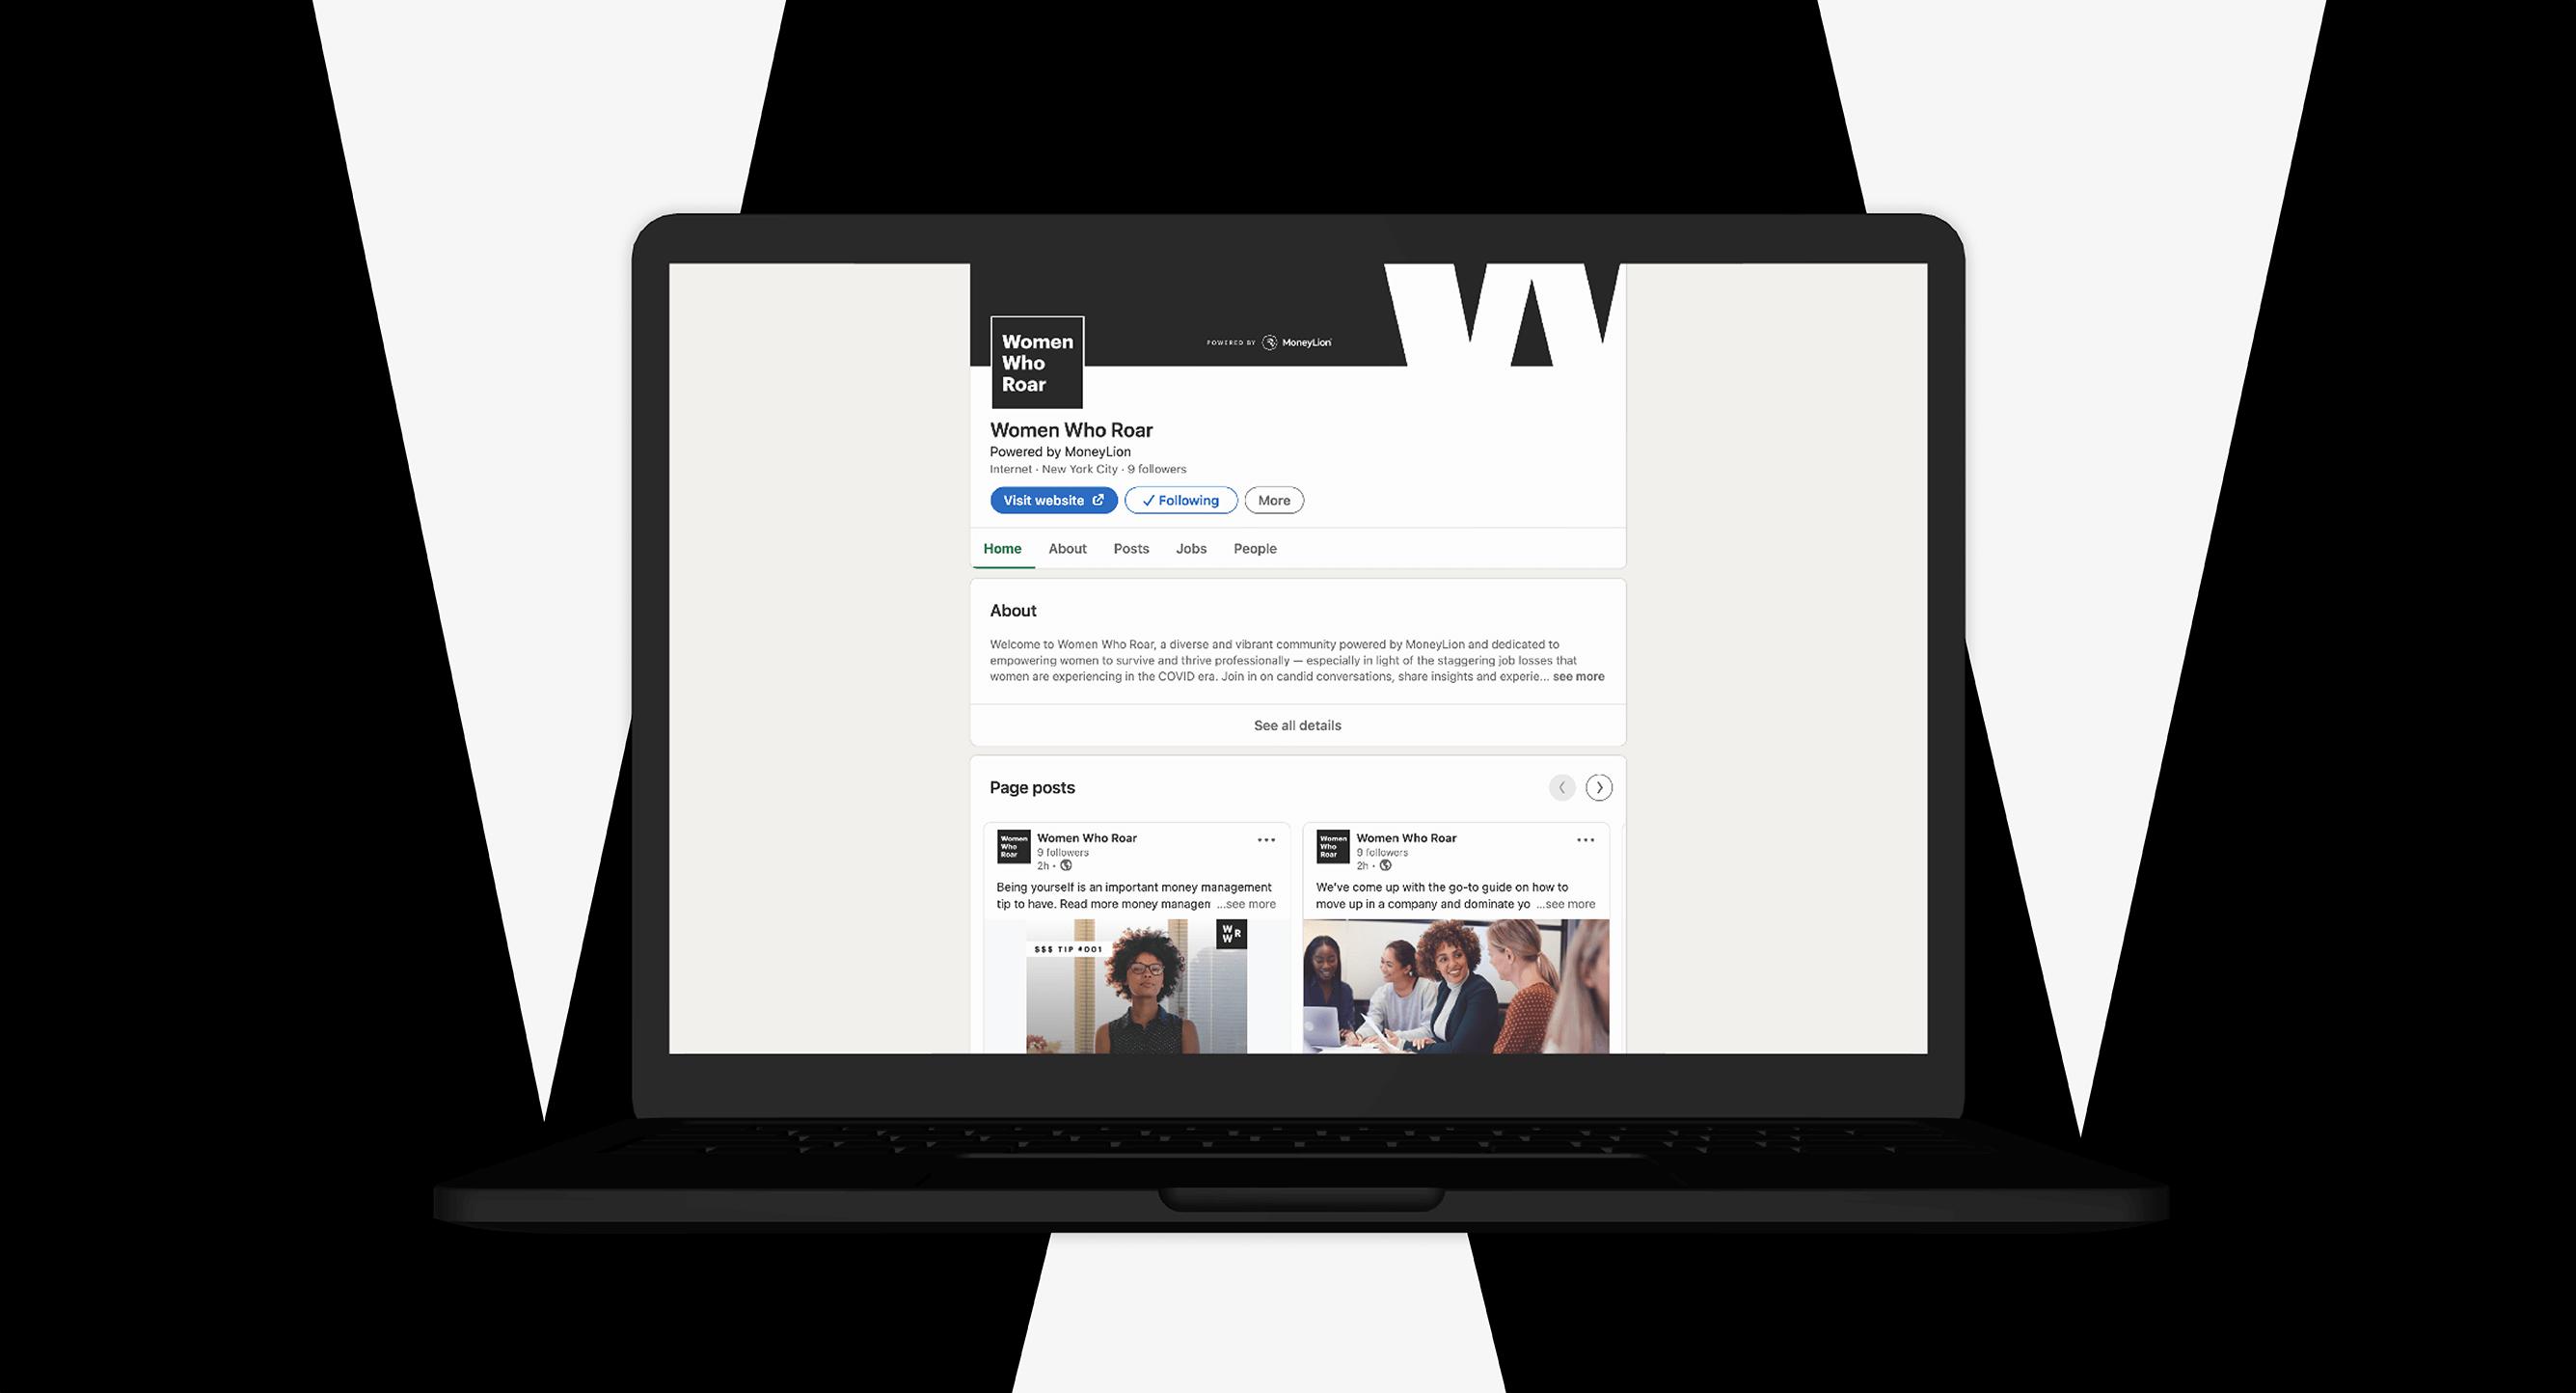 LinkedIn wwr community